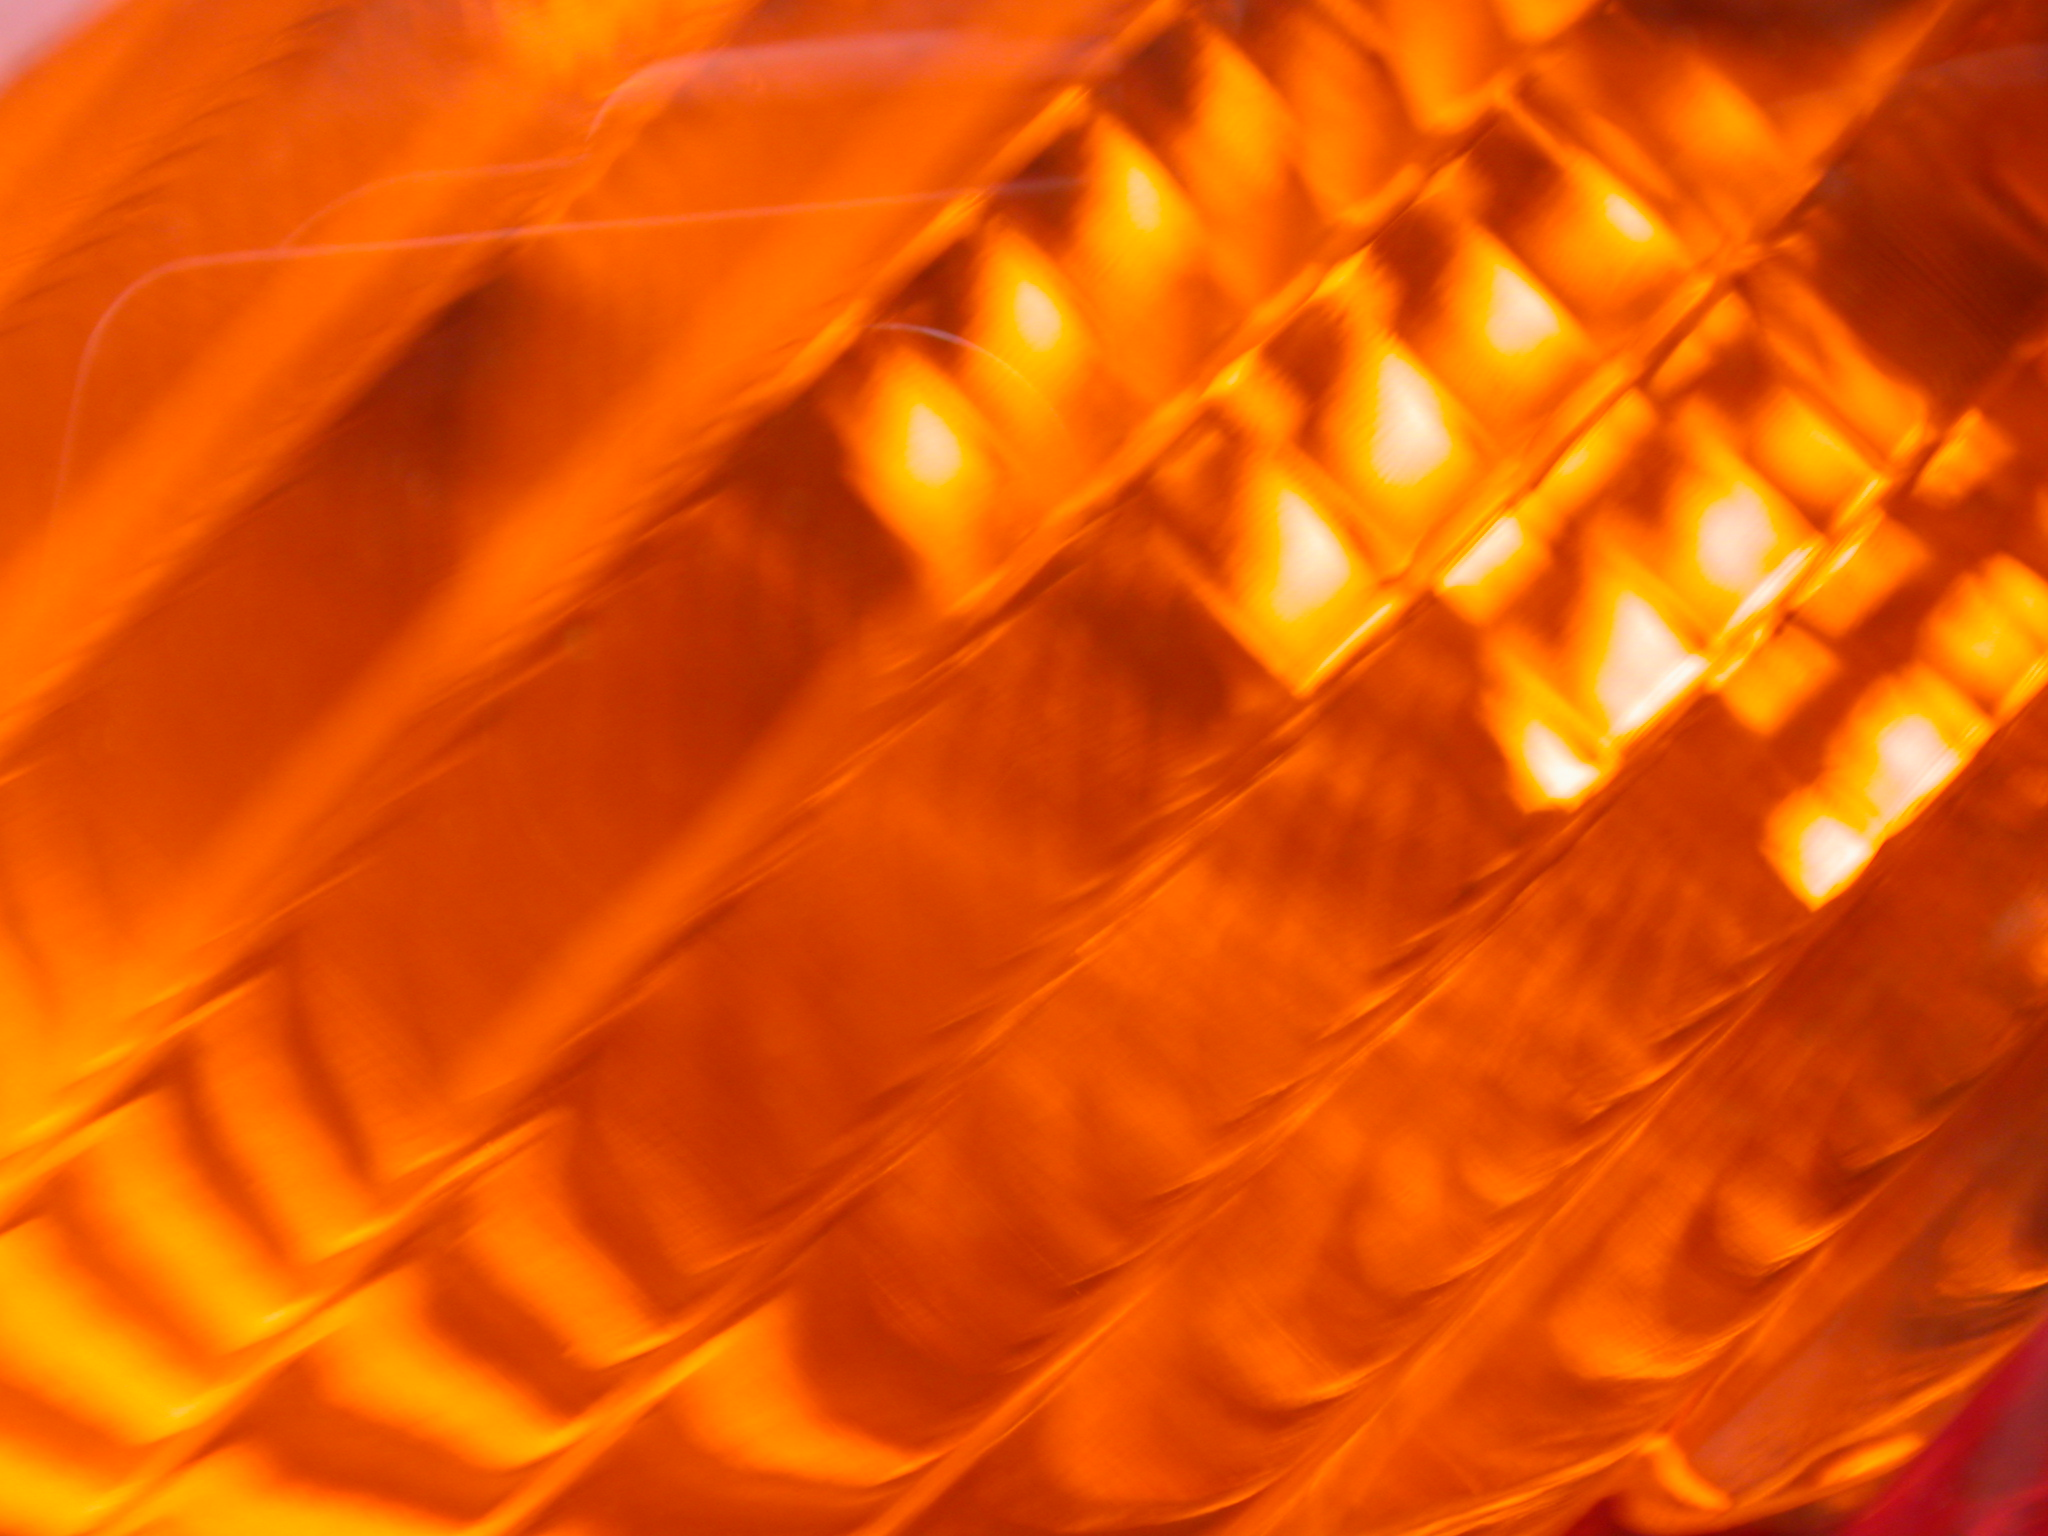 light blurs plastic orange speed blurry royalty